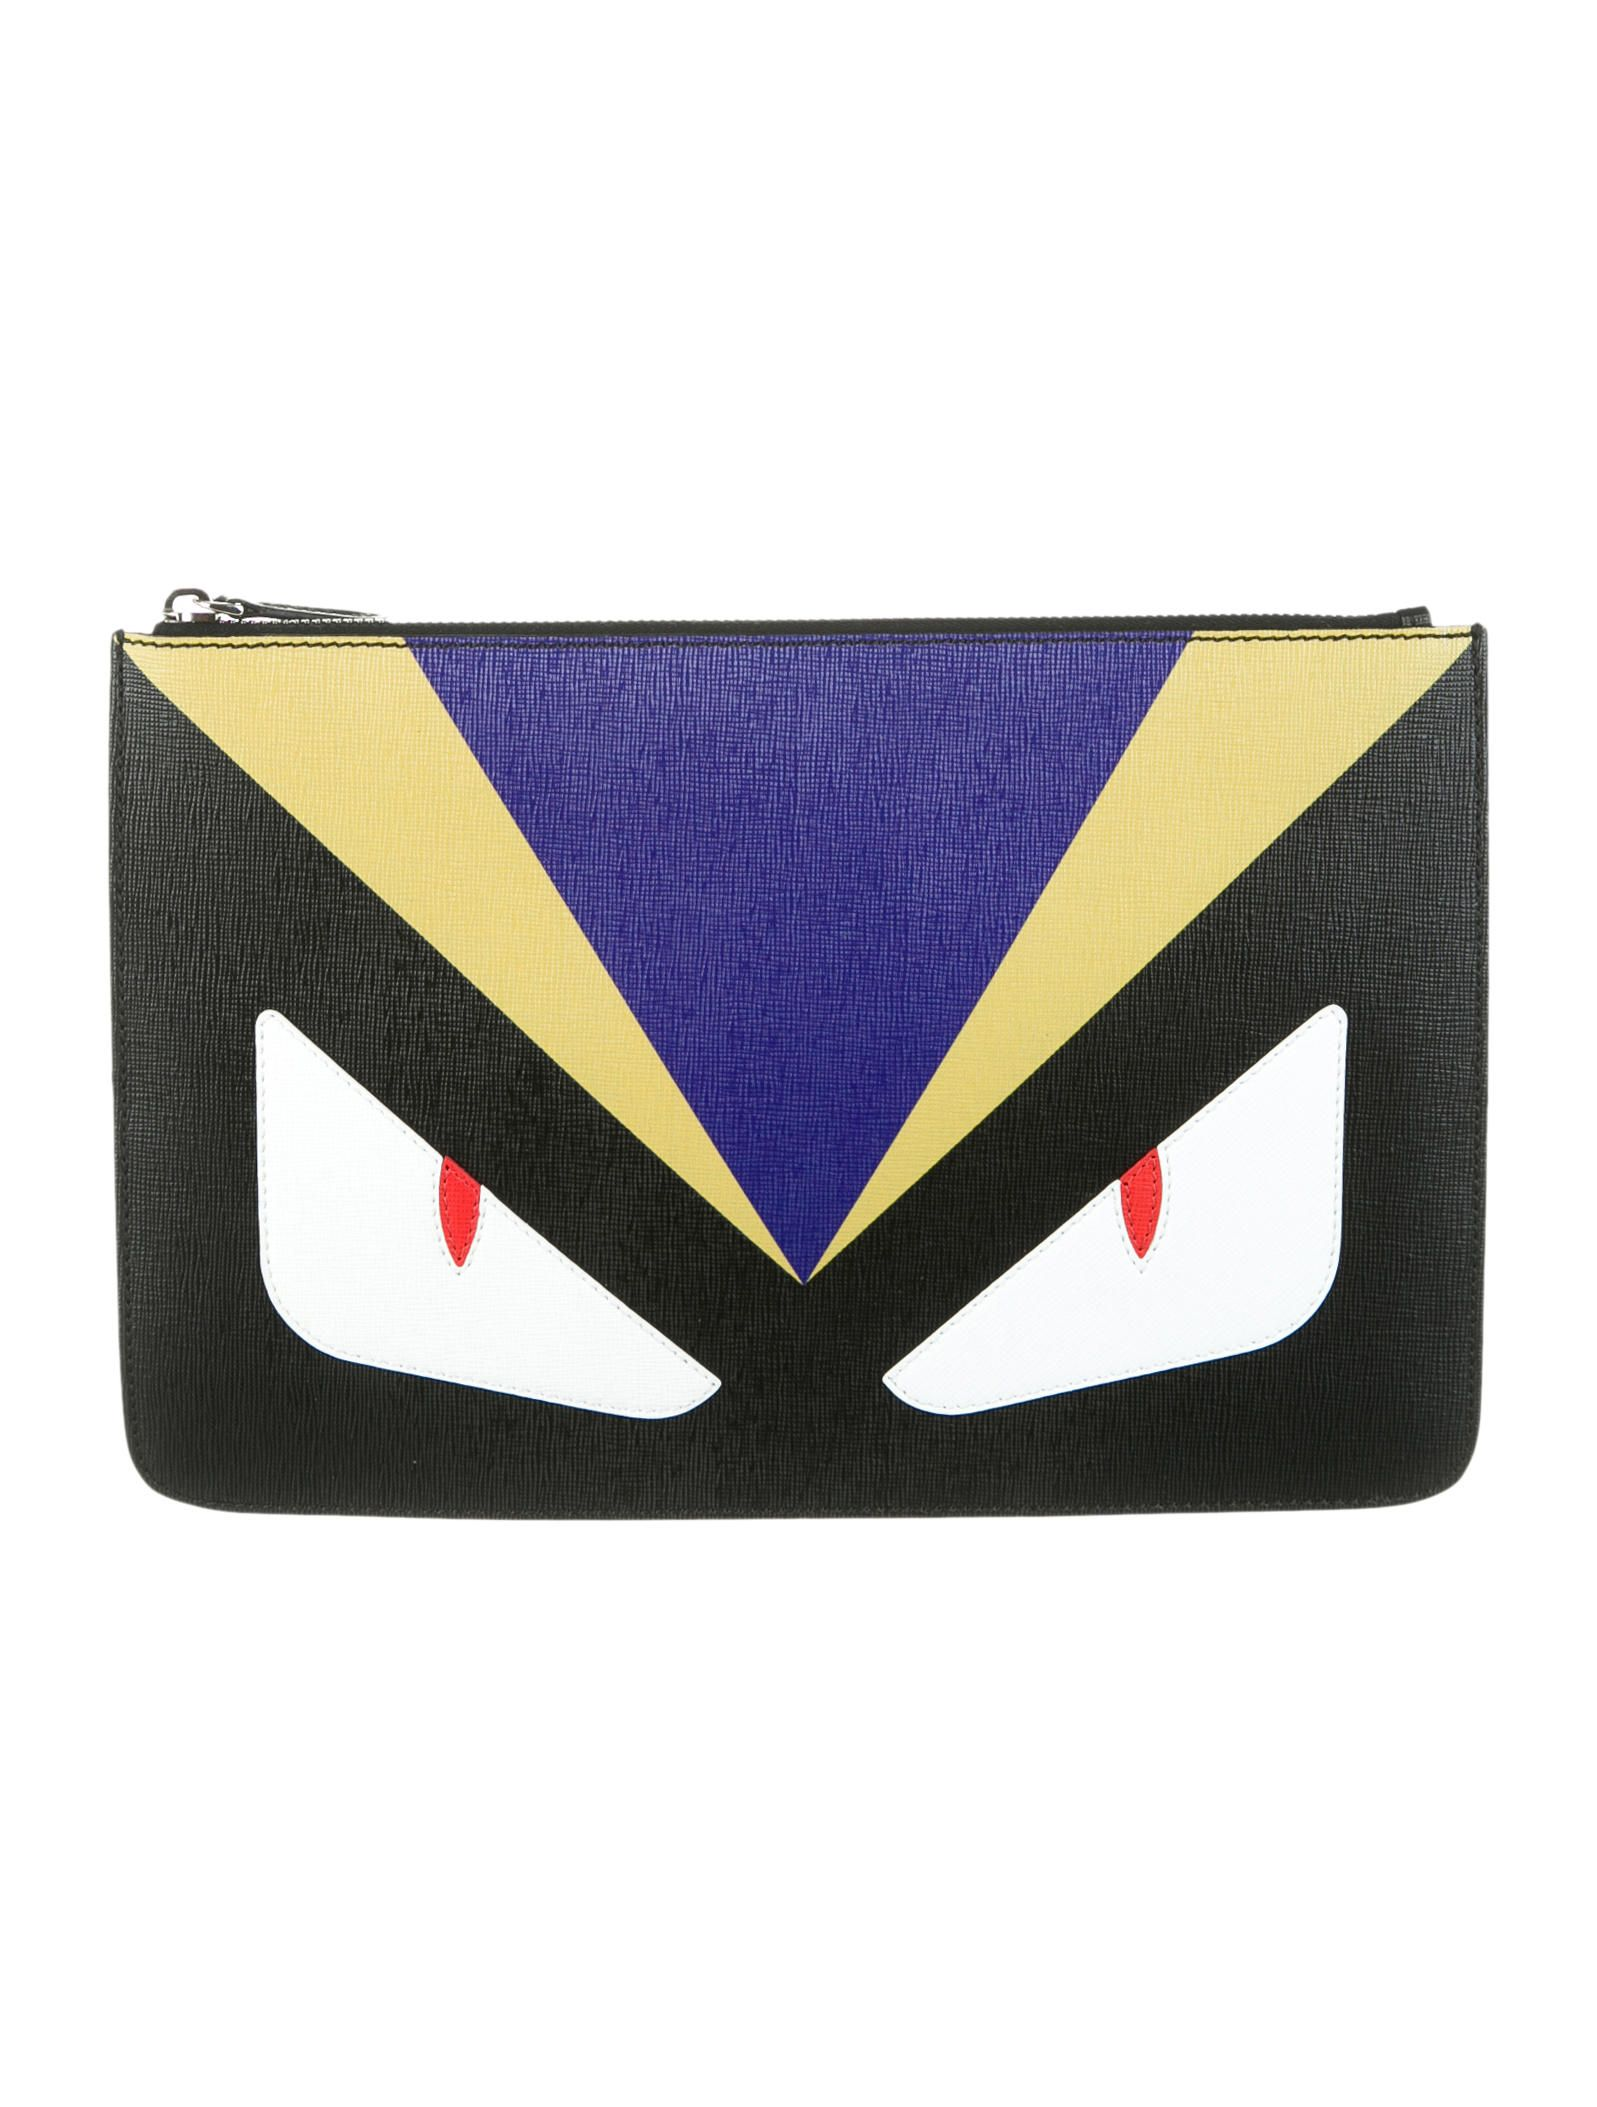 Fendi Monster Bag Clutch